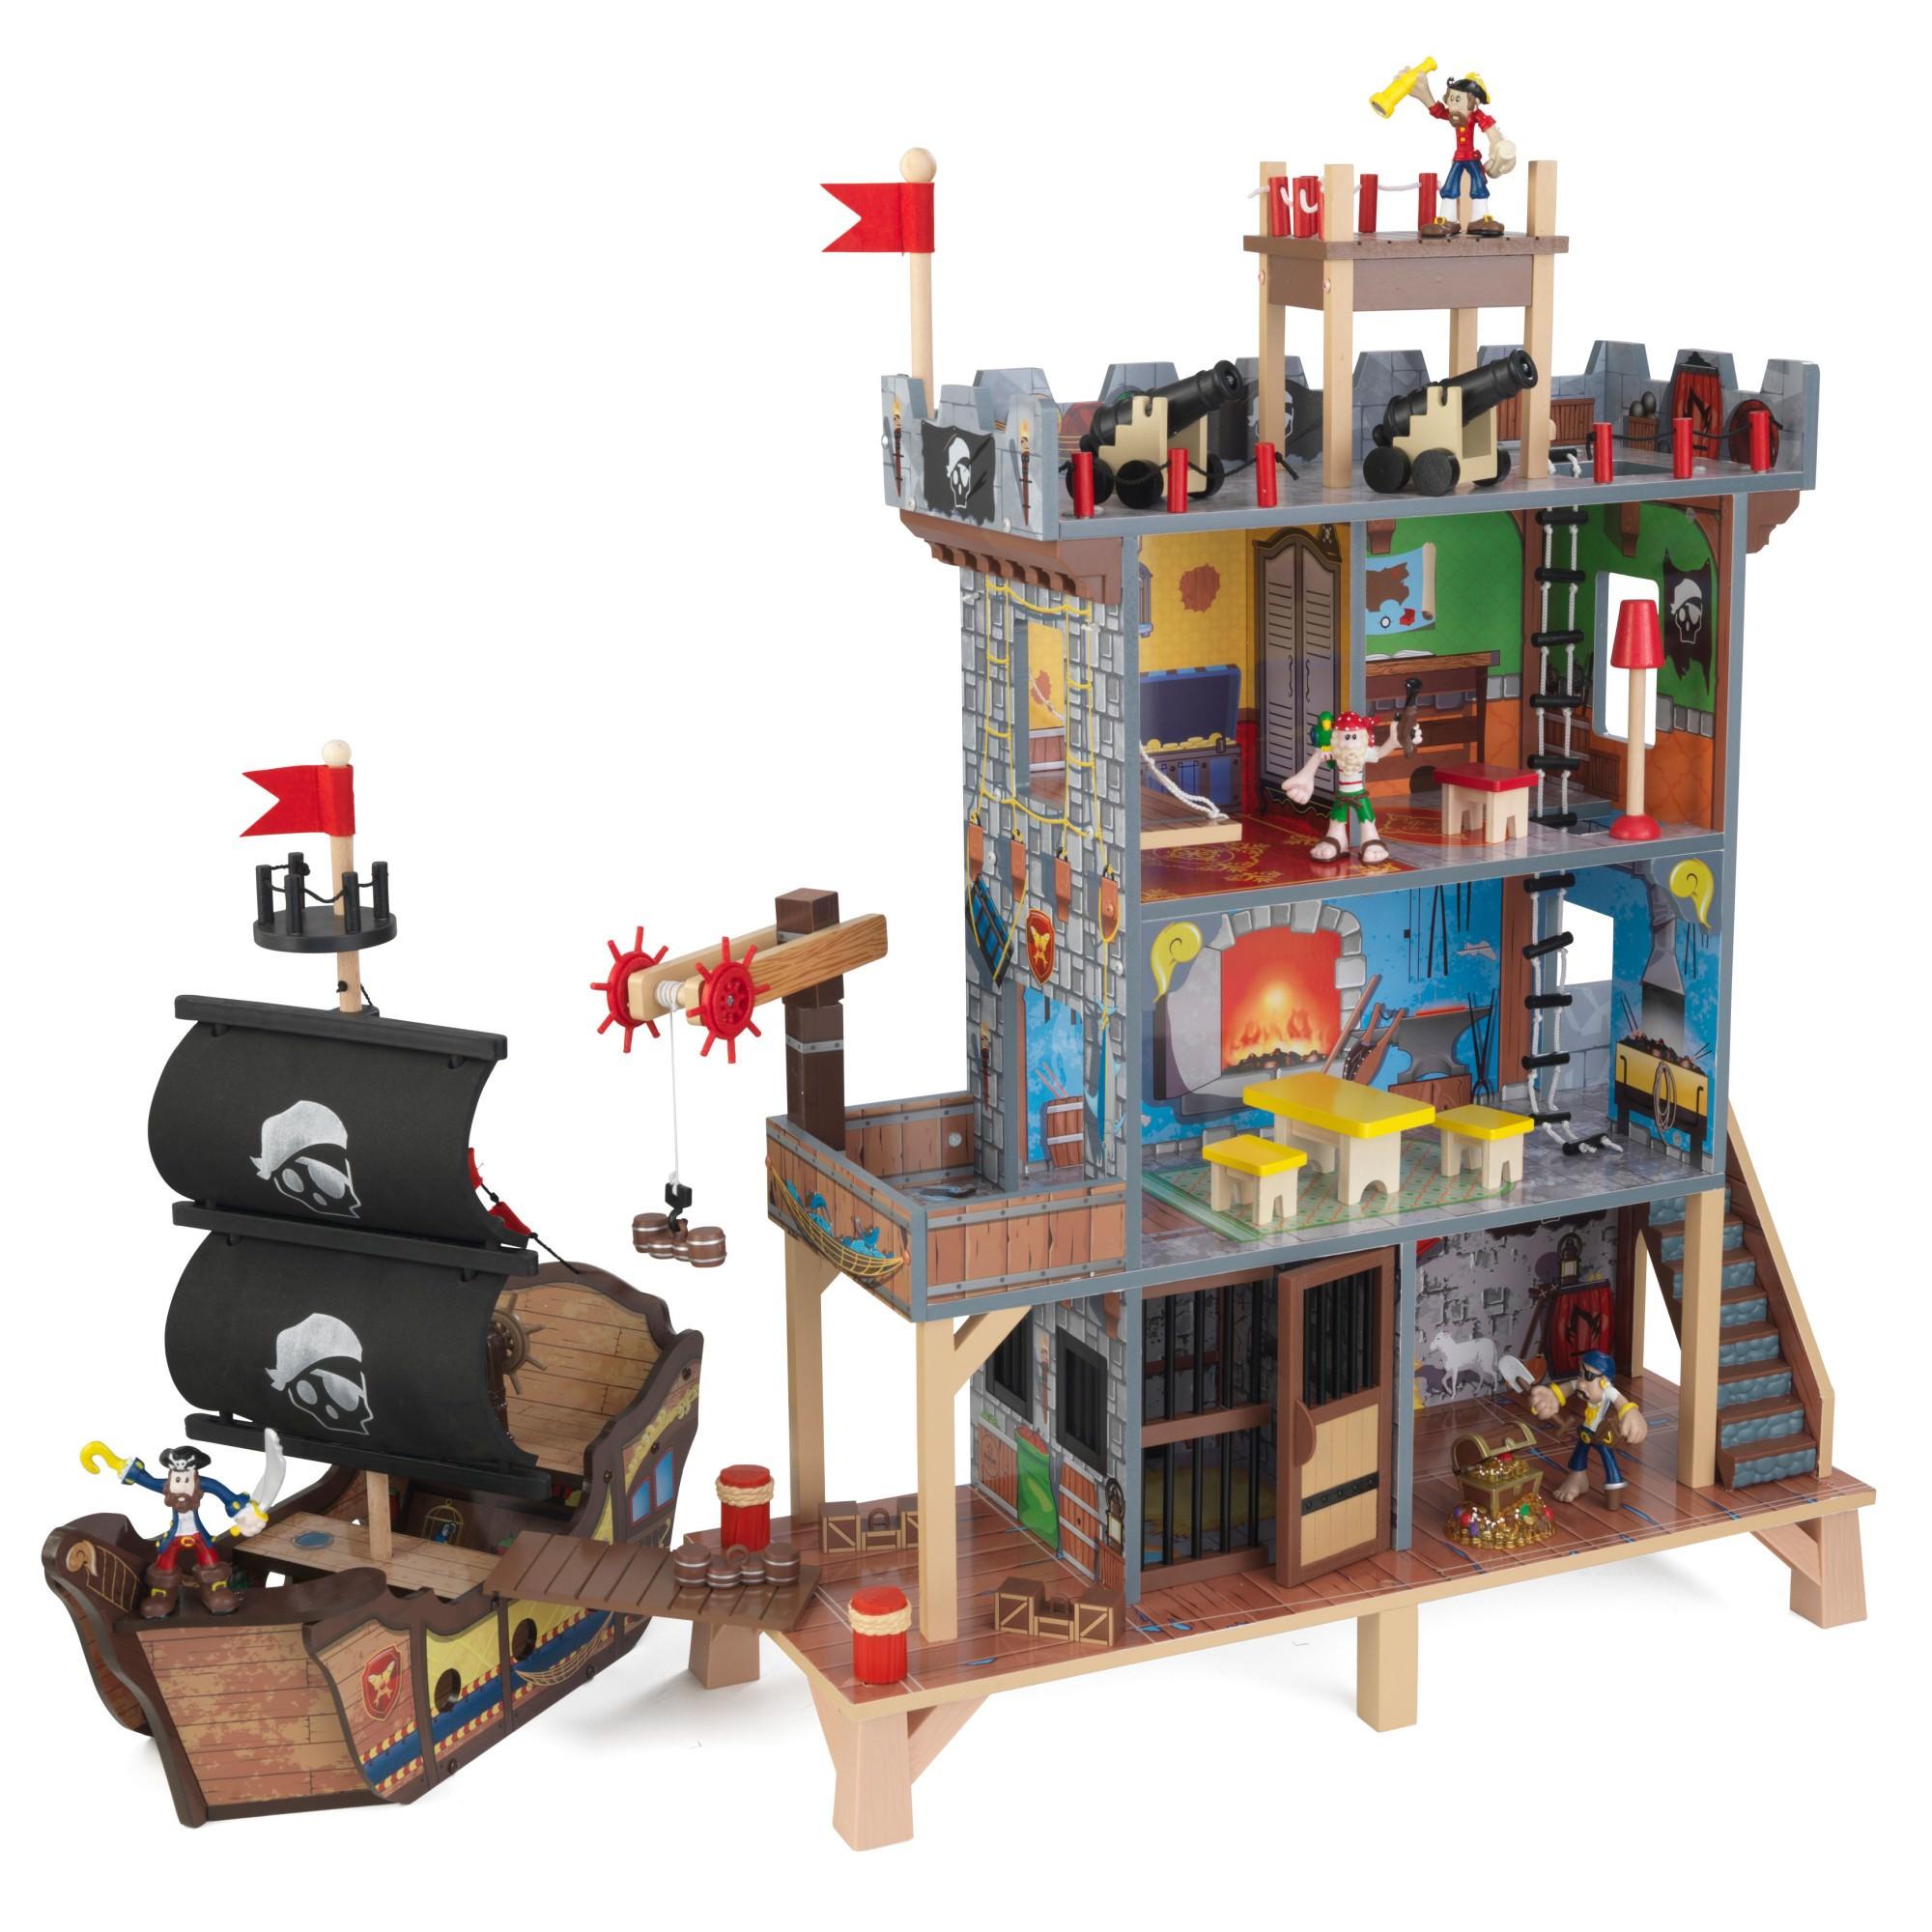 KidKraft Pirate Cove Wooden Play Set